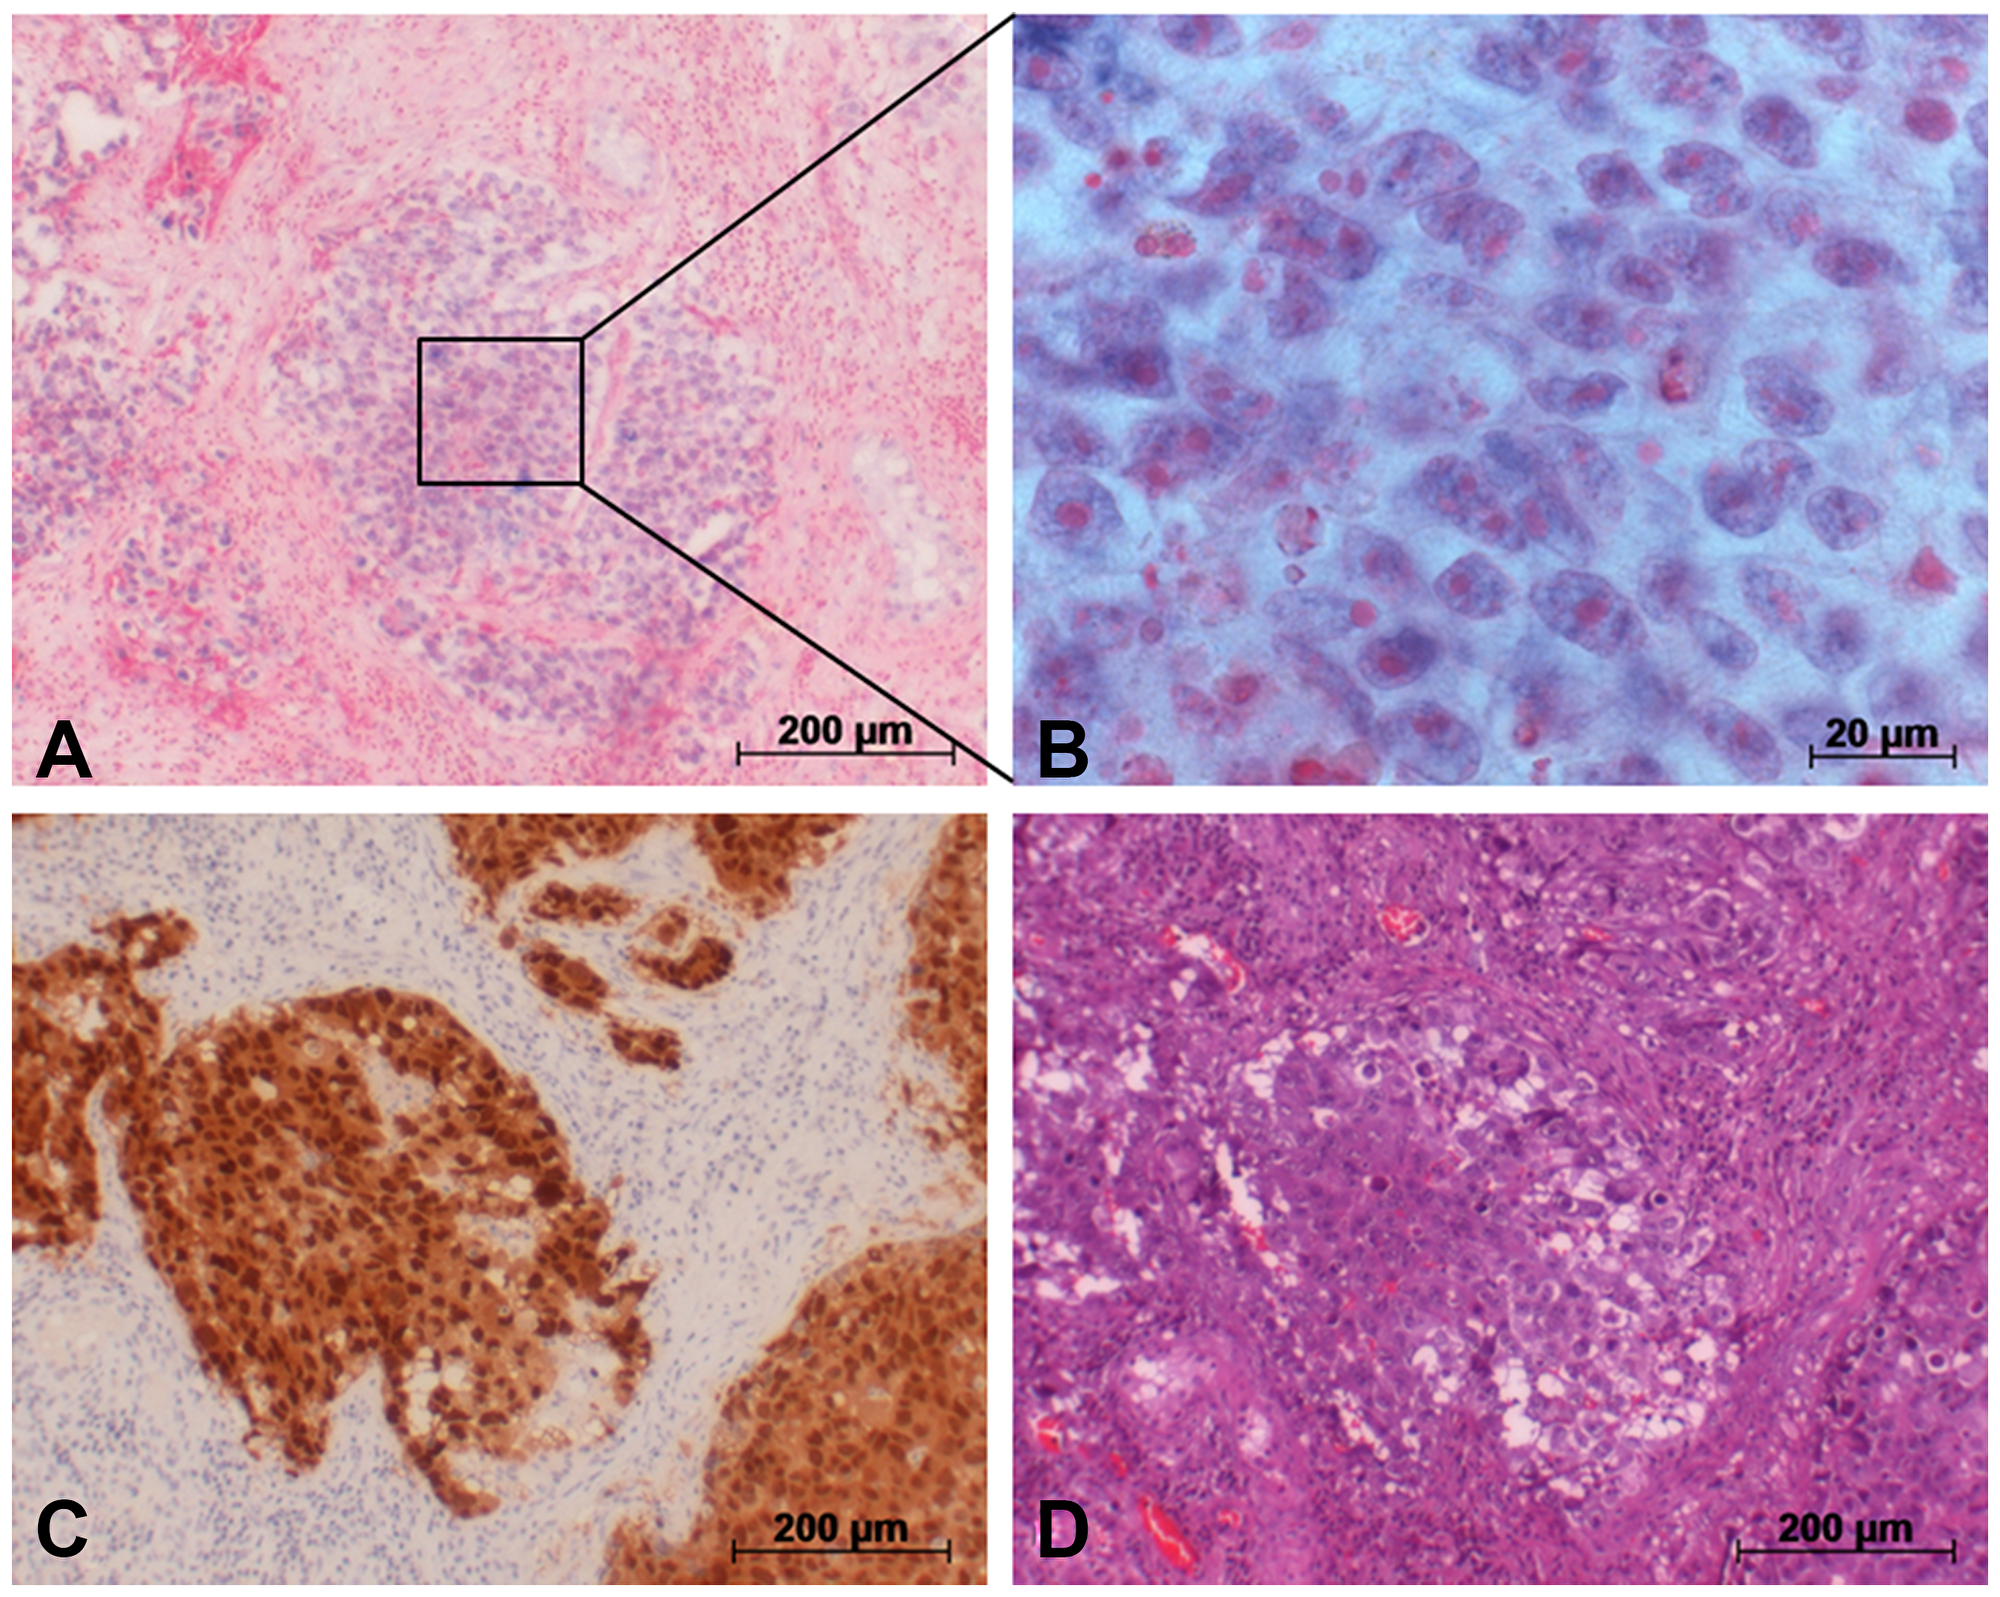 Detection of miR-371a-3p in GCT tumor (EC) via in situ hybridization.